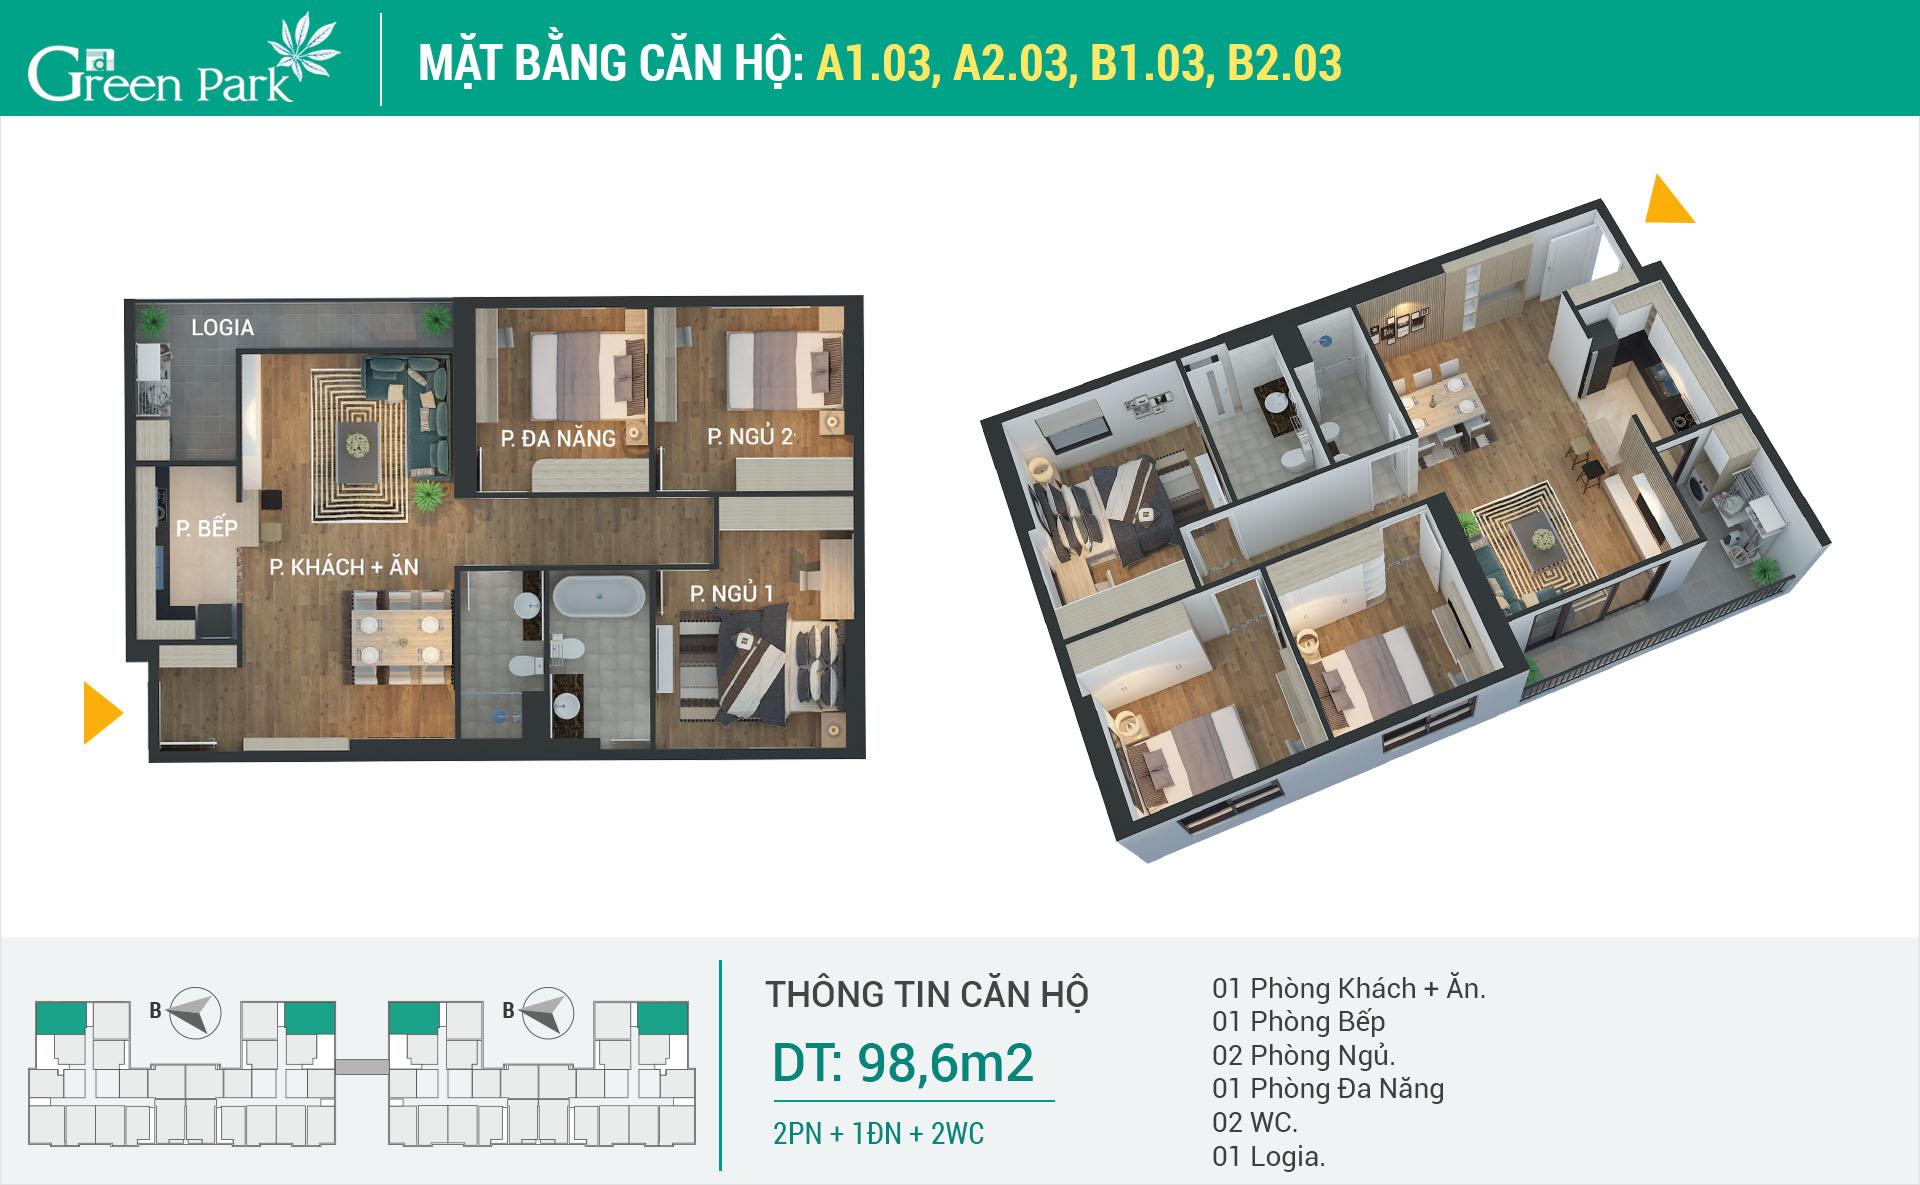 Mặt bằng căn hộ A1-03, A2-03, B1-03, B2-03